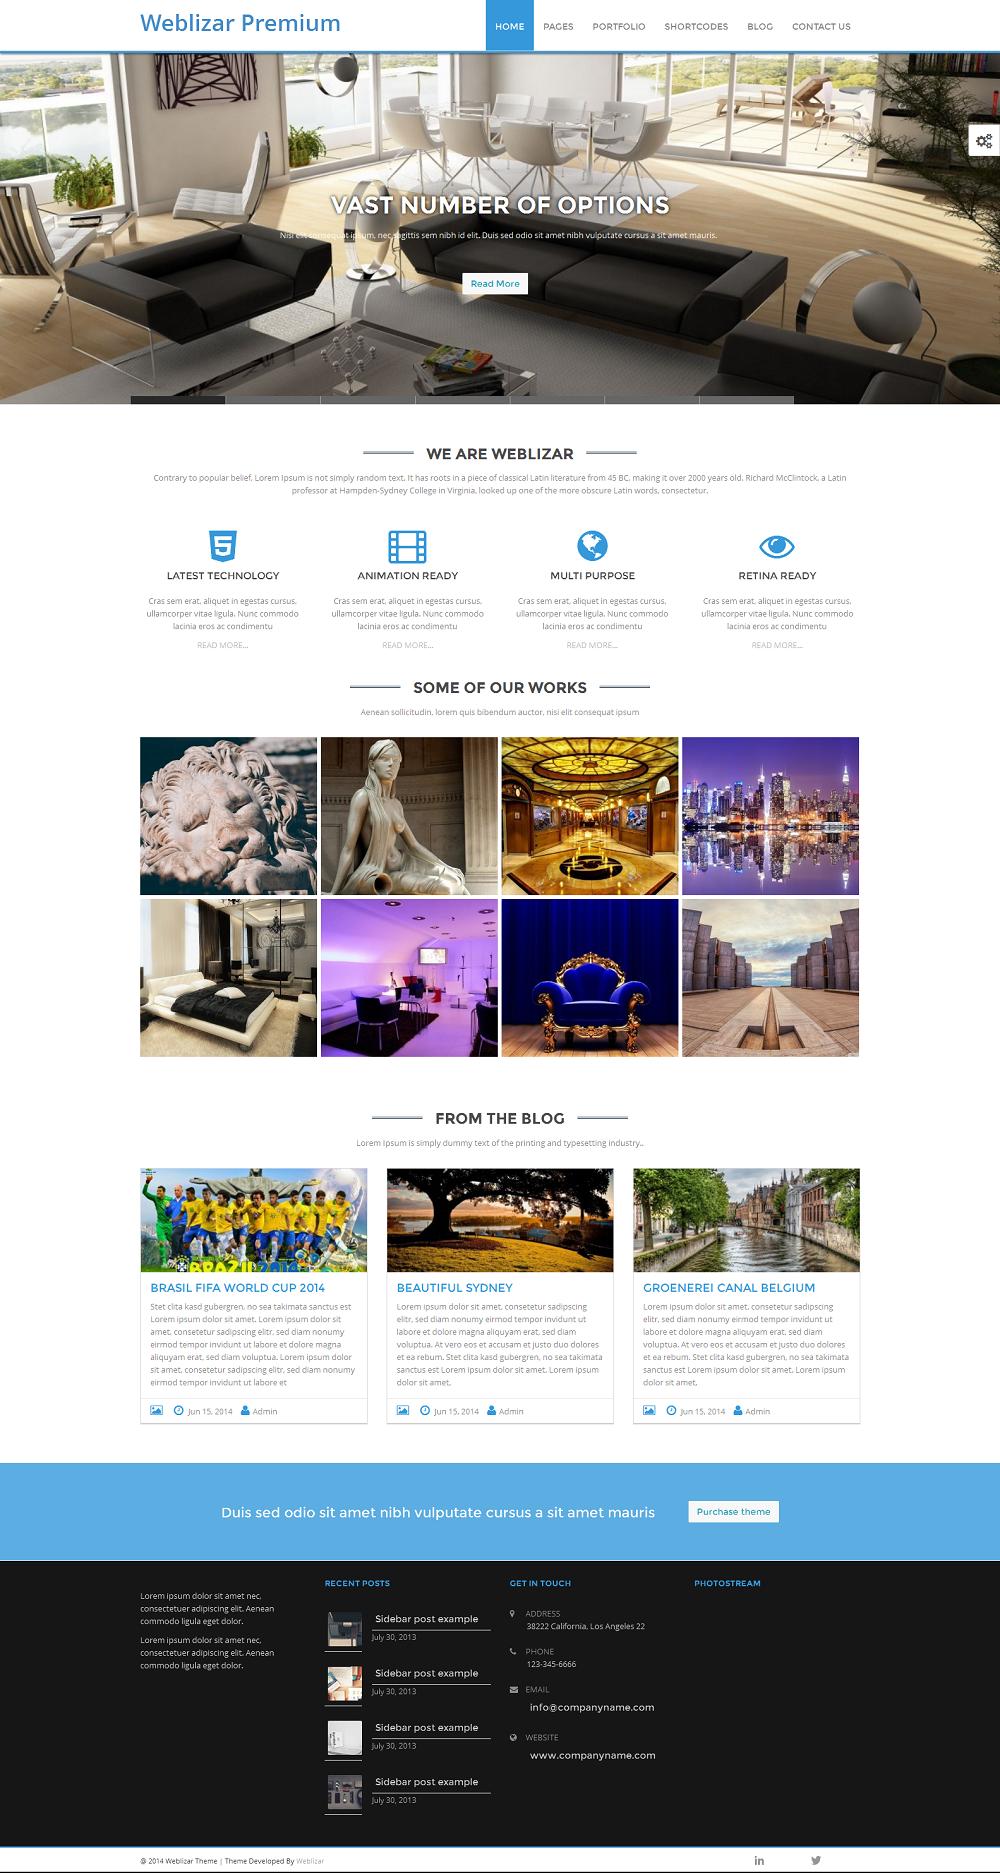 weblizar-premium-theme-home-page